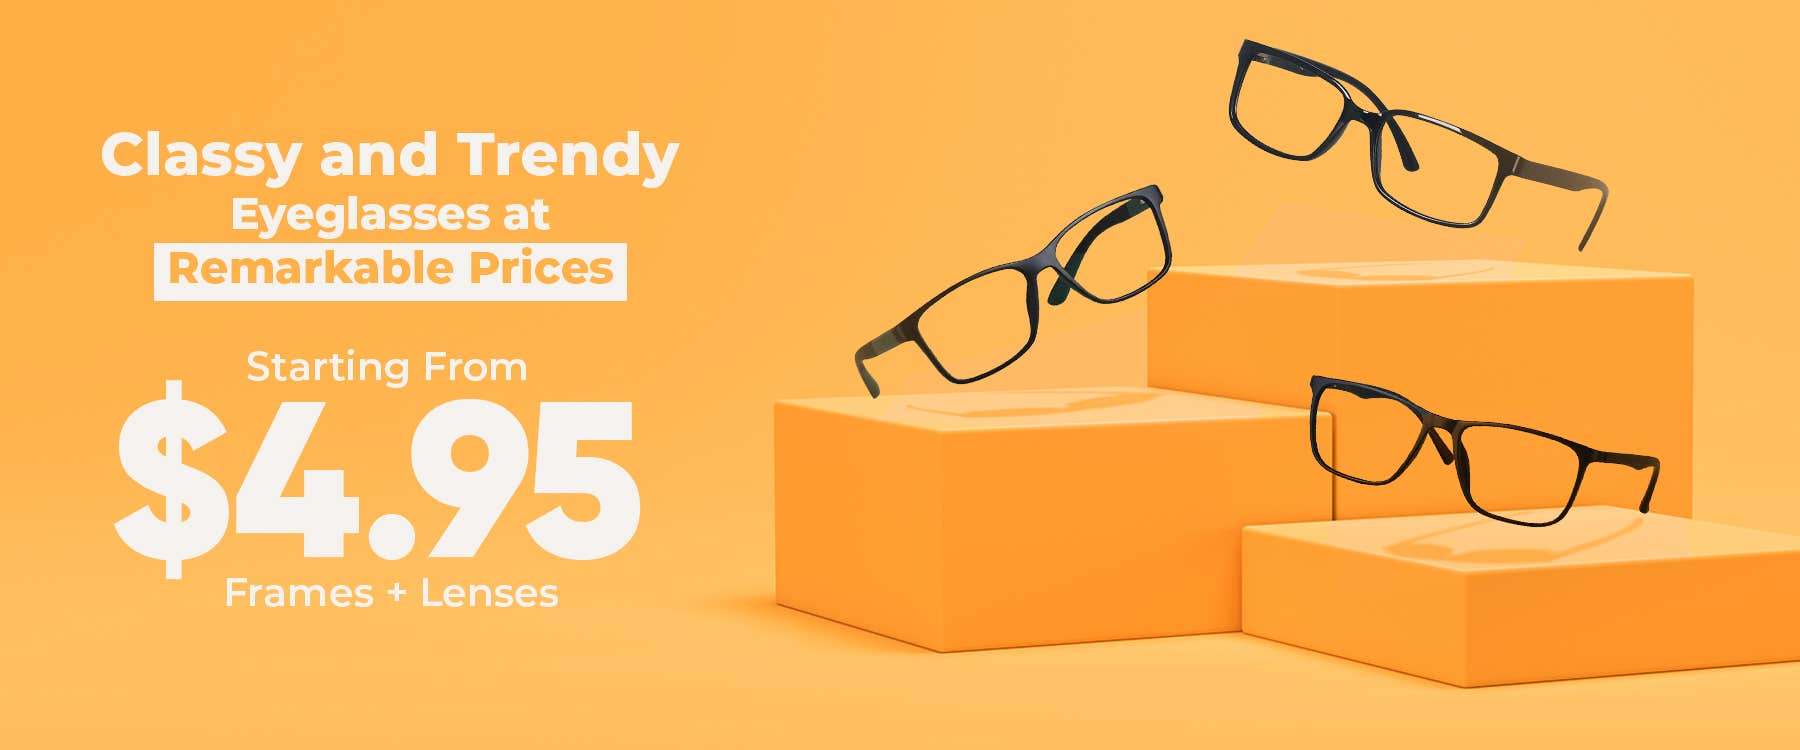 Eyeglasses Starting From Just $4.95